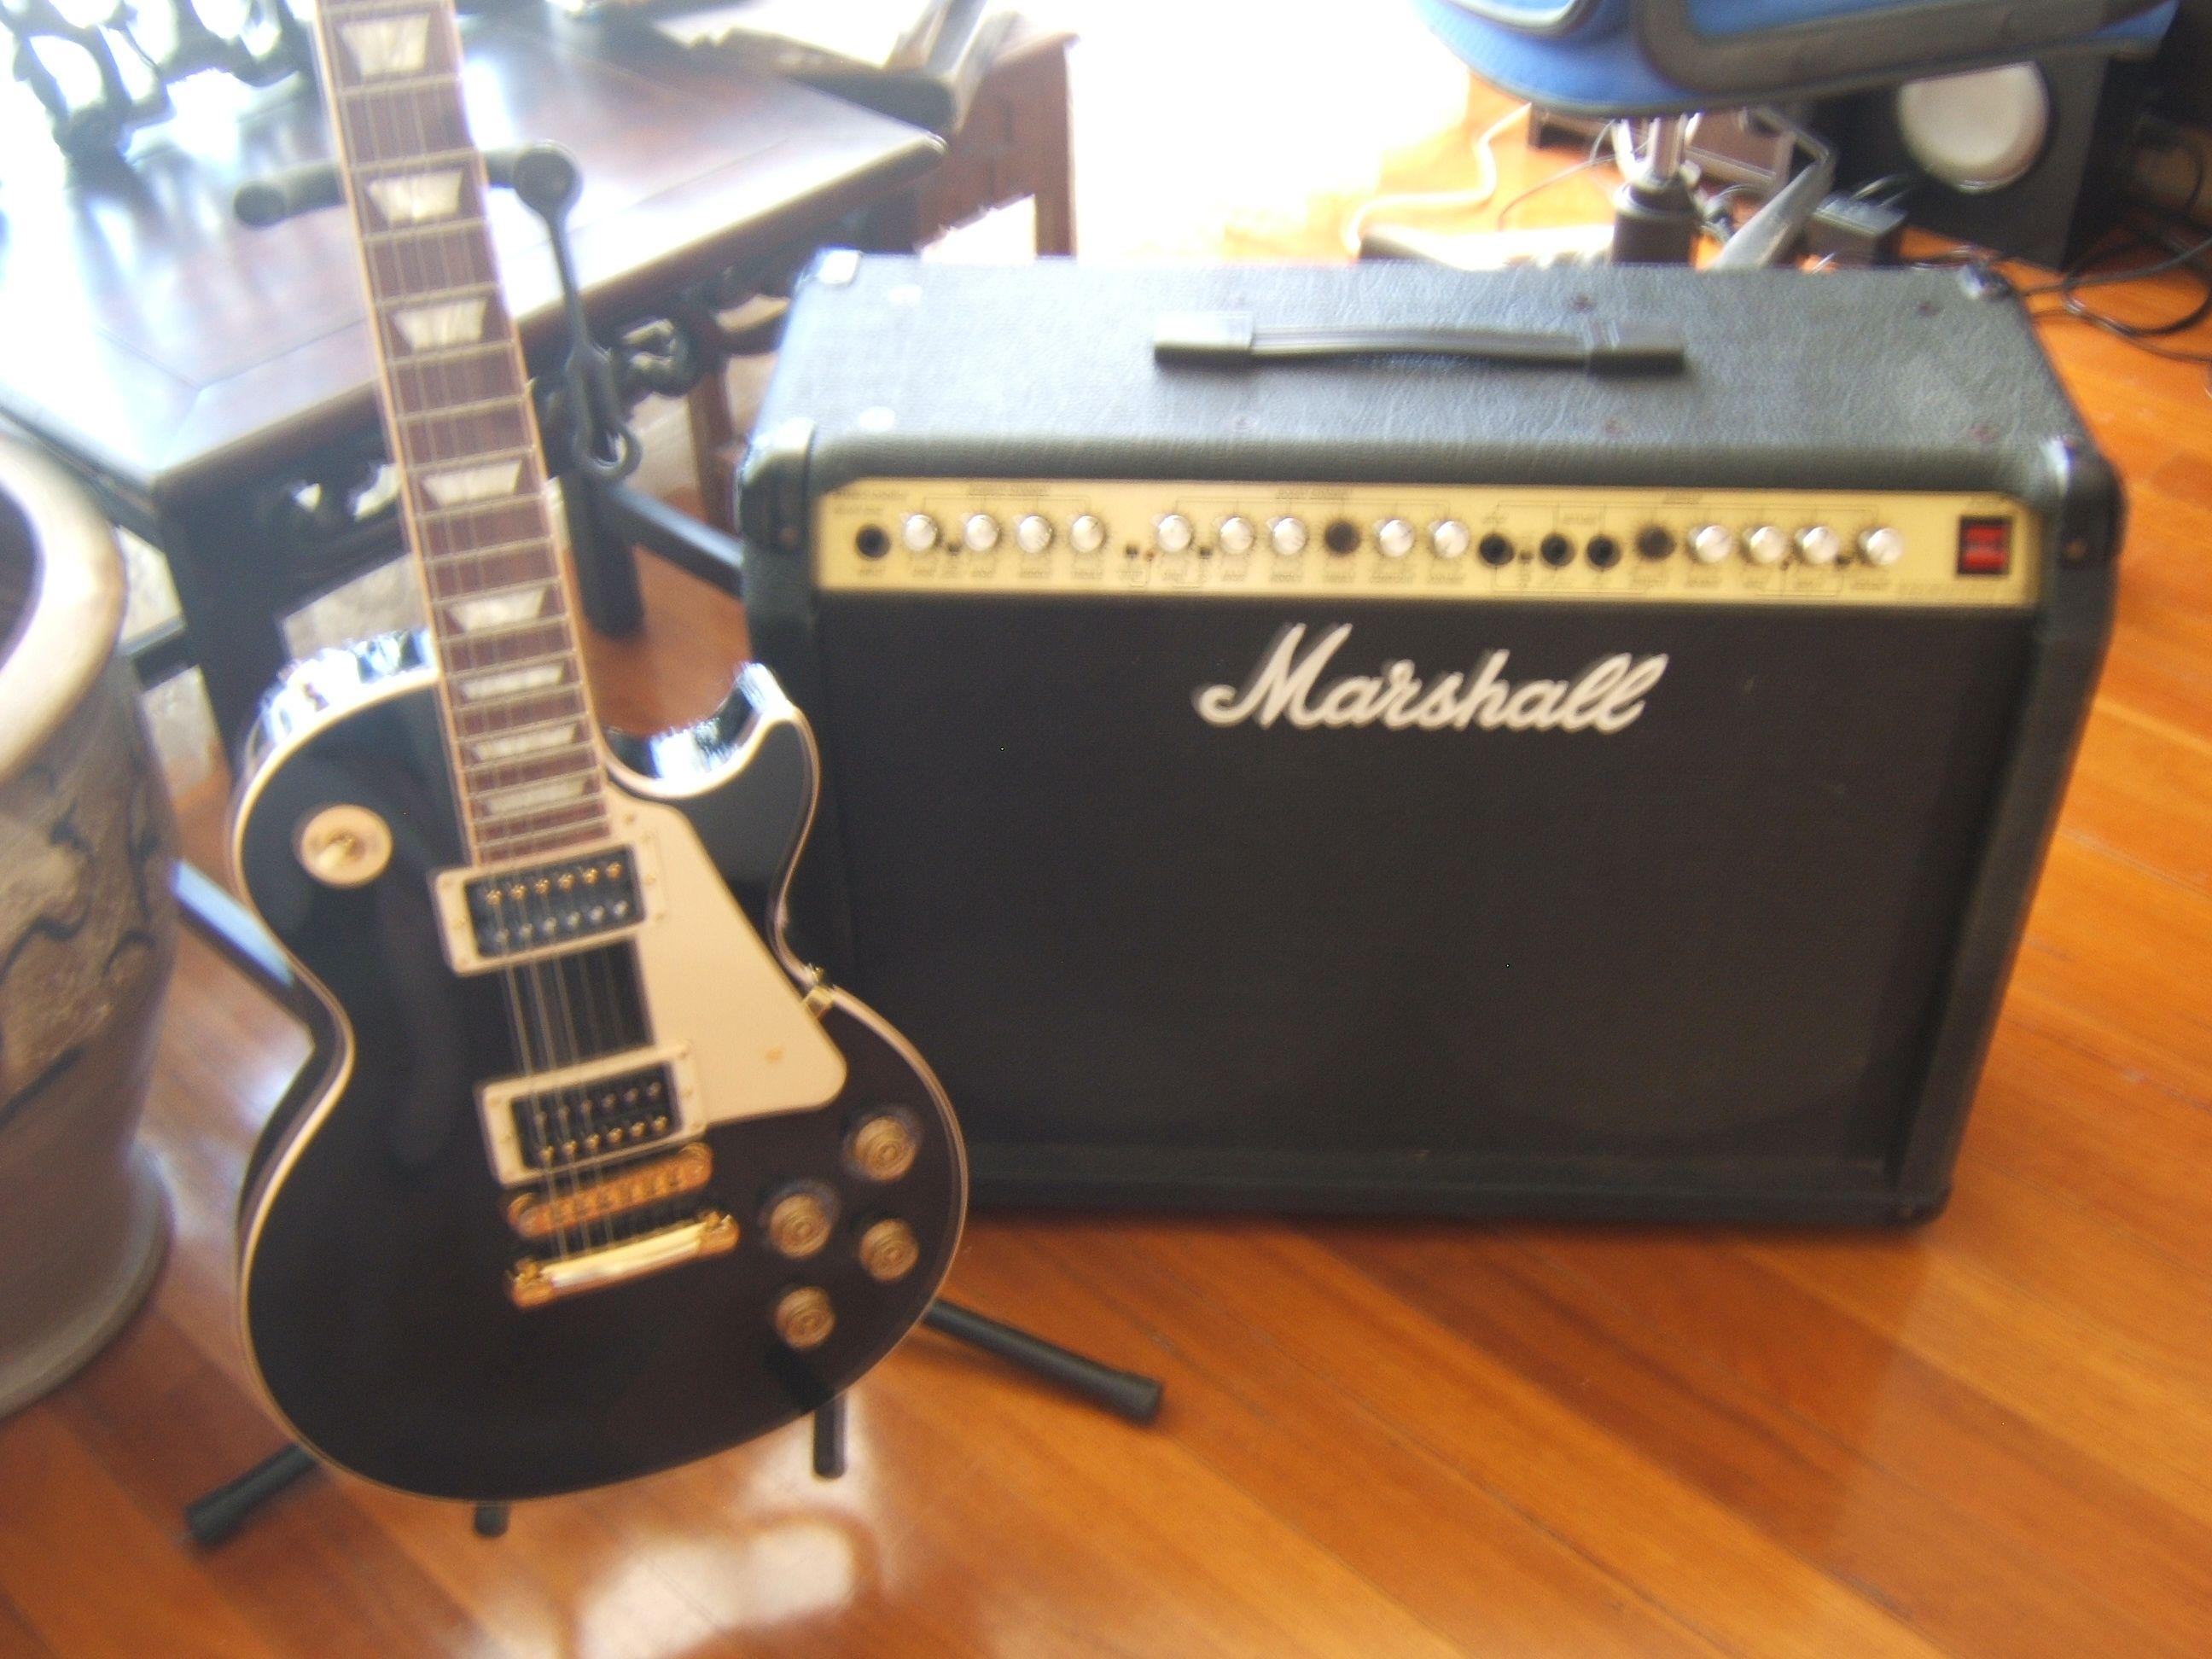 My Gibson Les Paul & Marshall 100 Watt amp